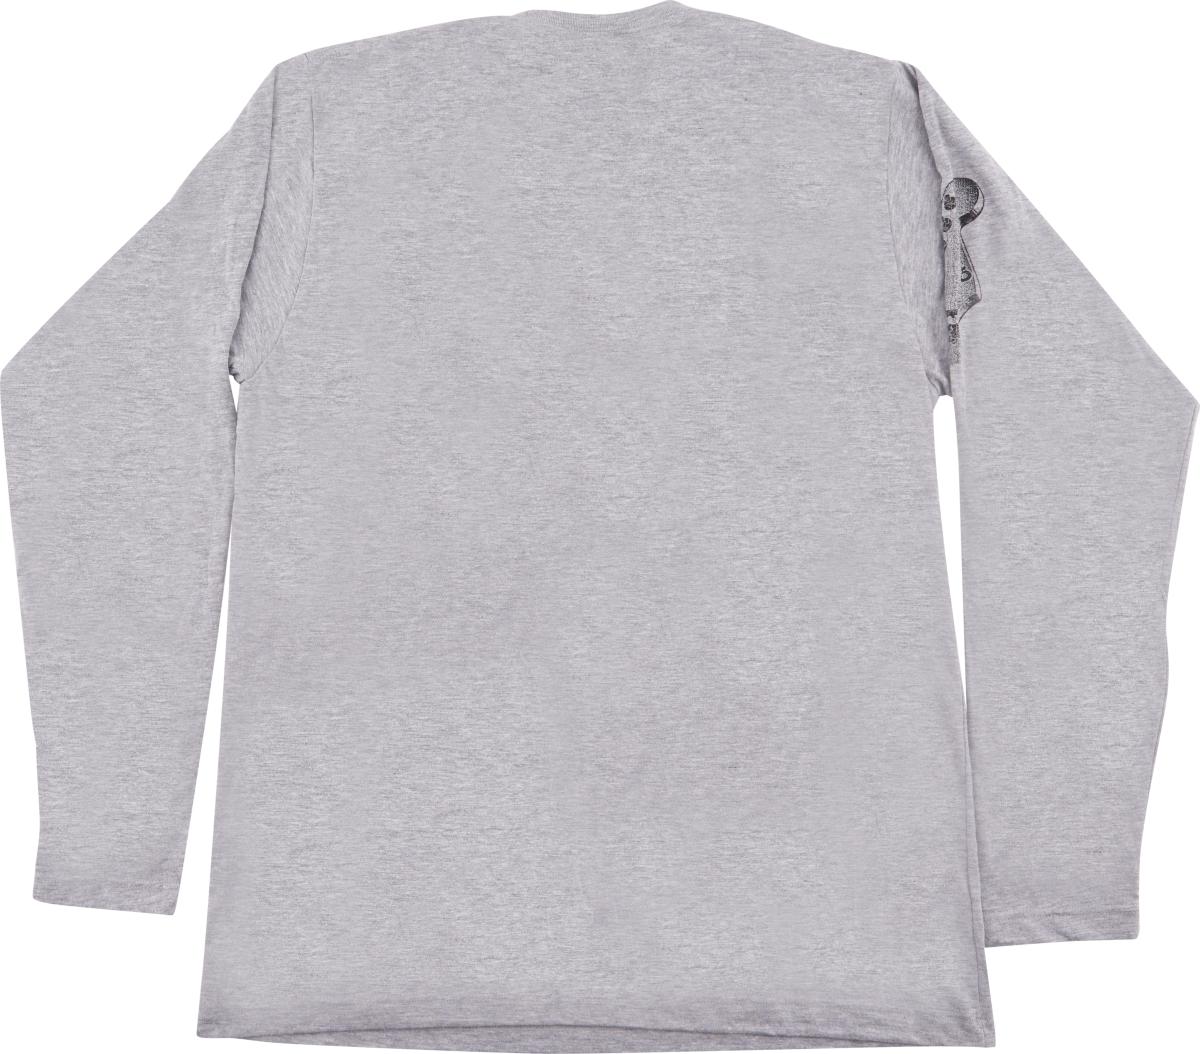 Charvel Charvel® Headstock Long Sleeve T-Shirt, Gray, XXL